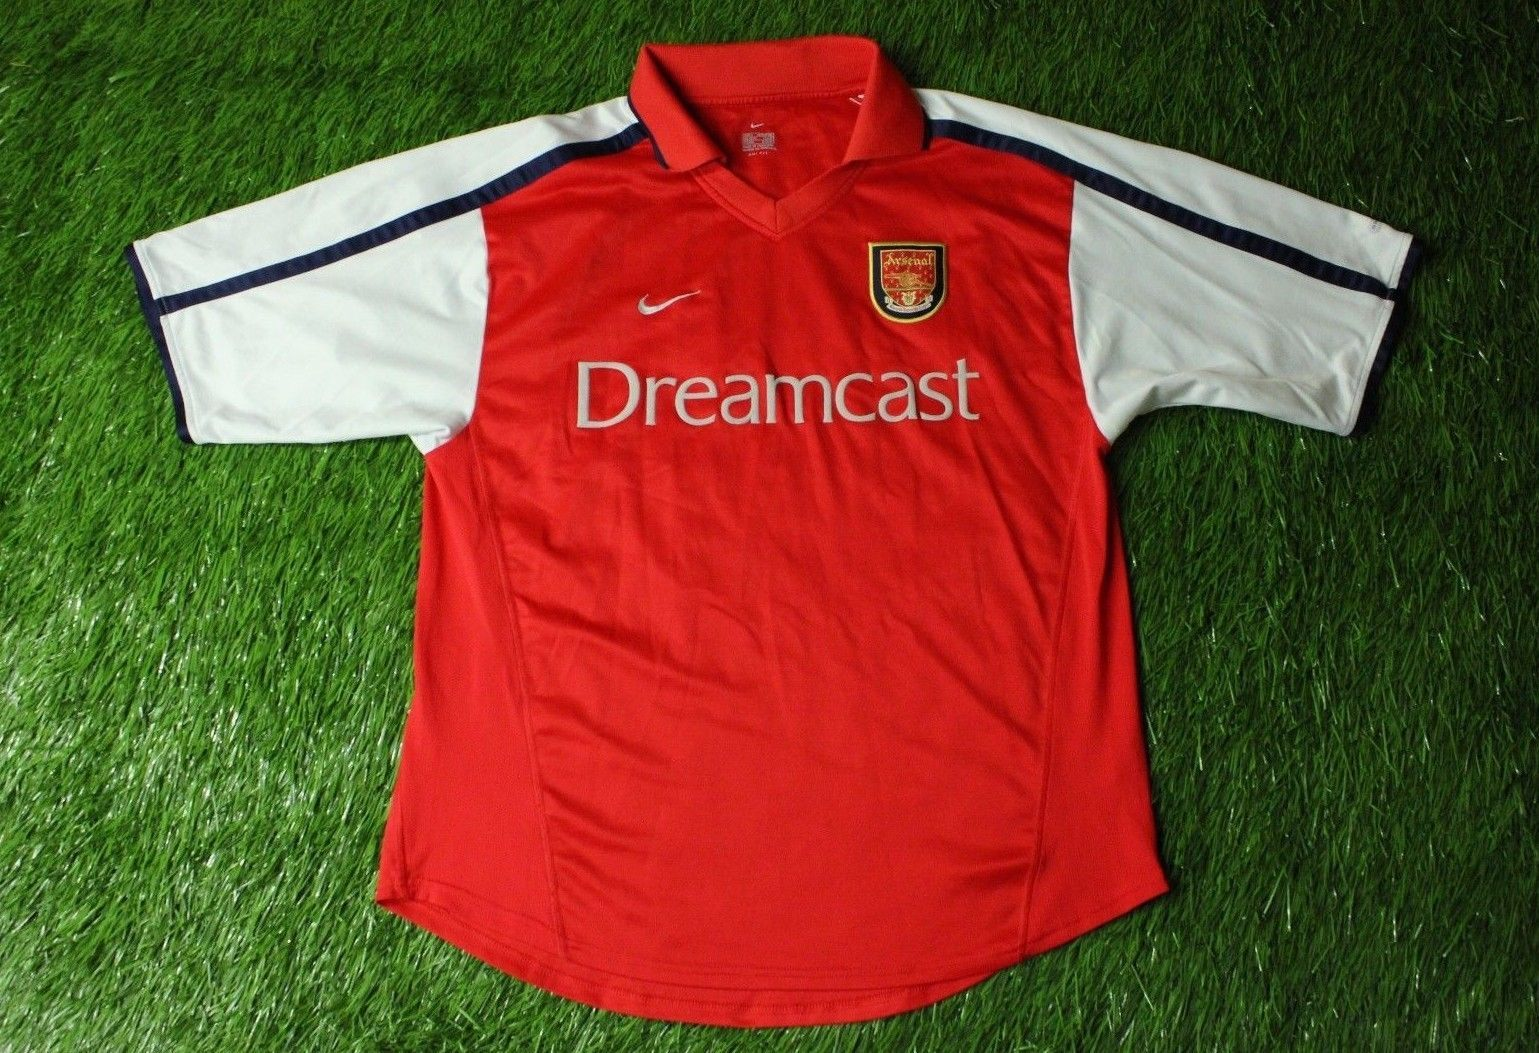 9353ec1f77f ARSENAL LONDON ENGLAND 2000 2002 RARE FOOTBALL SHIRT JERSEY HOME NIKE  ORIGINAL (eBay Link)